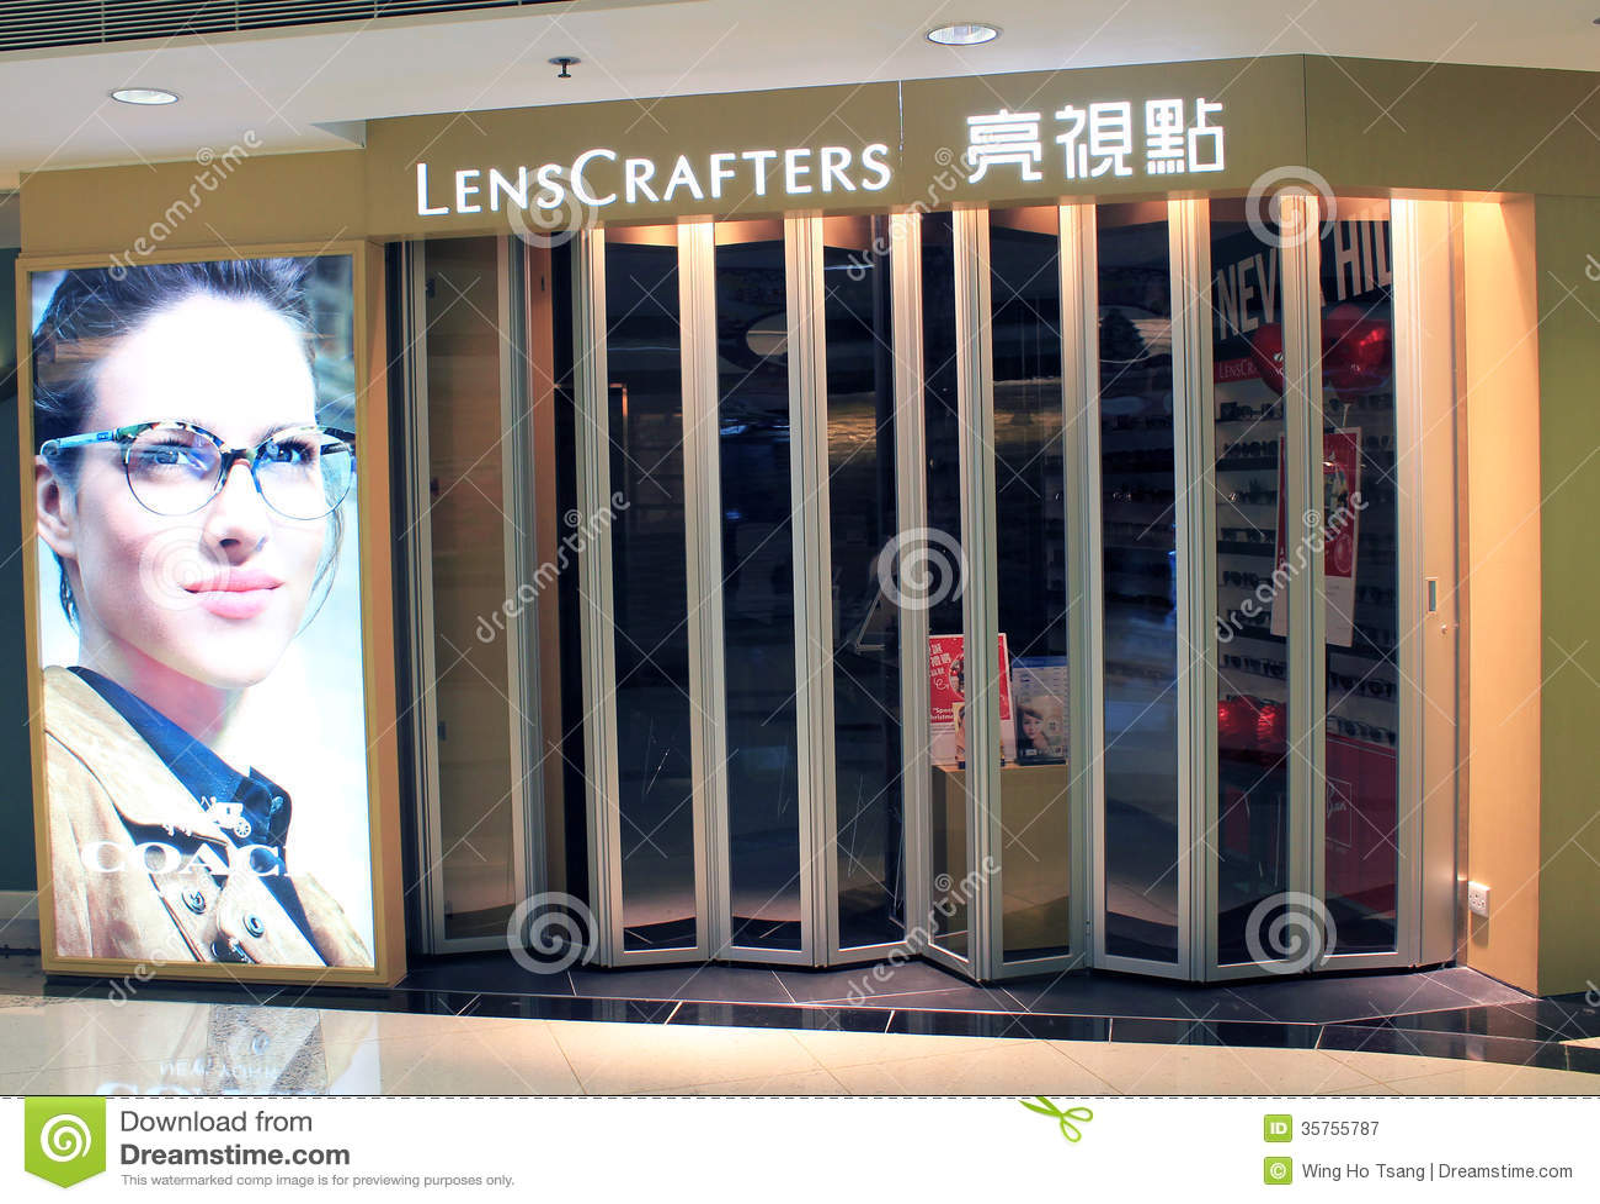 Lenscrafters business plan